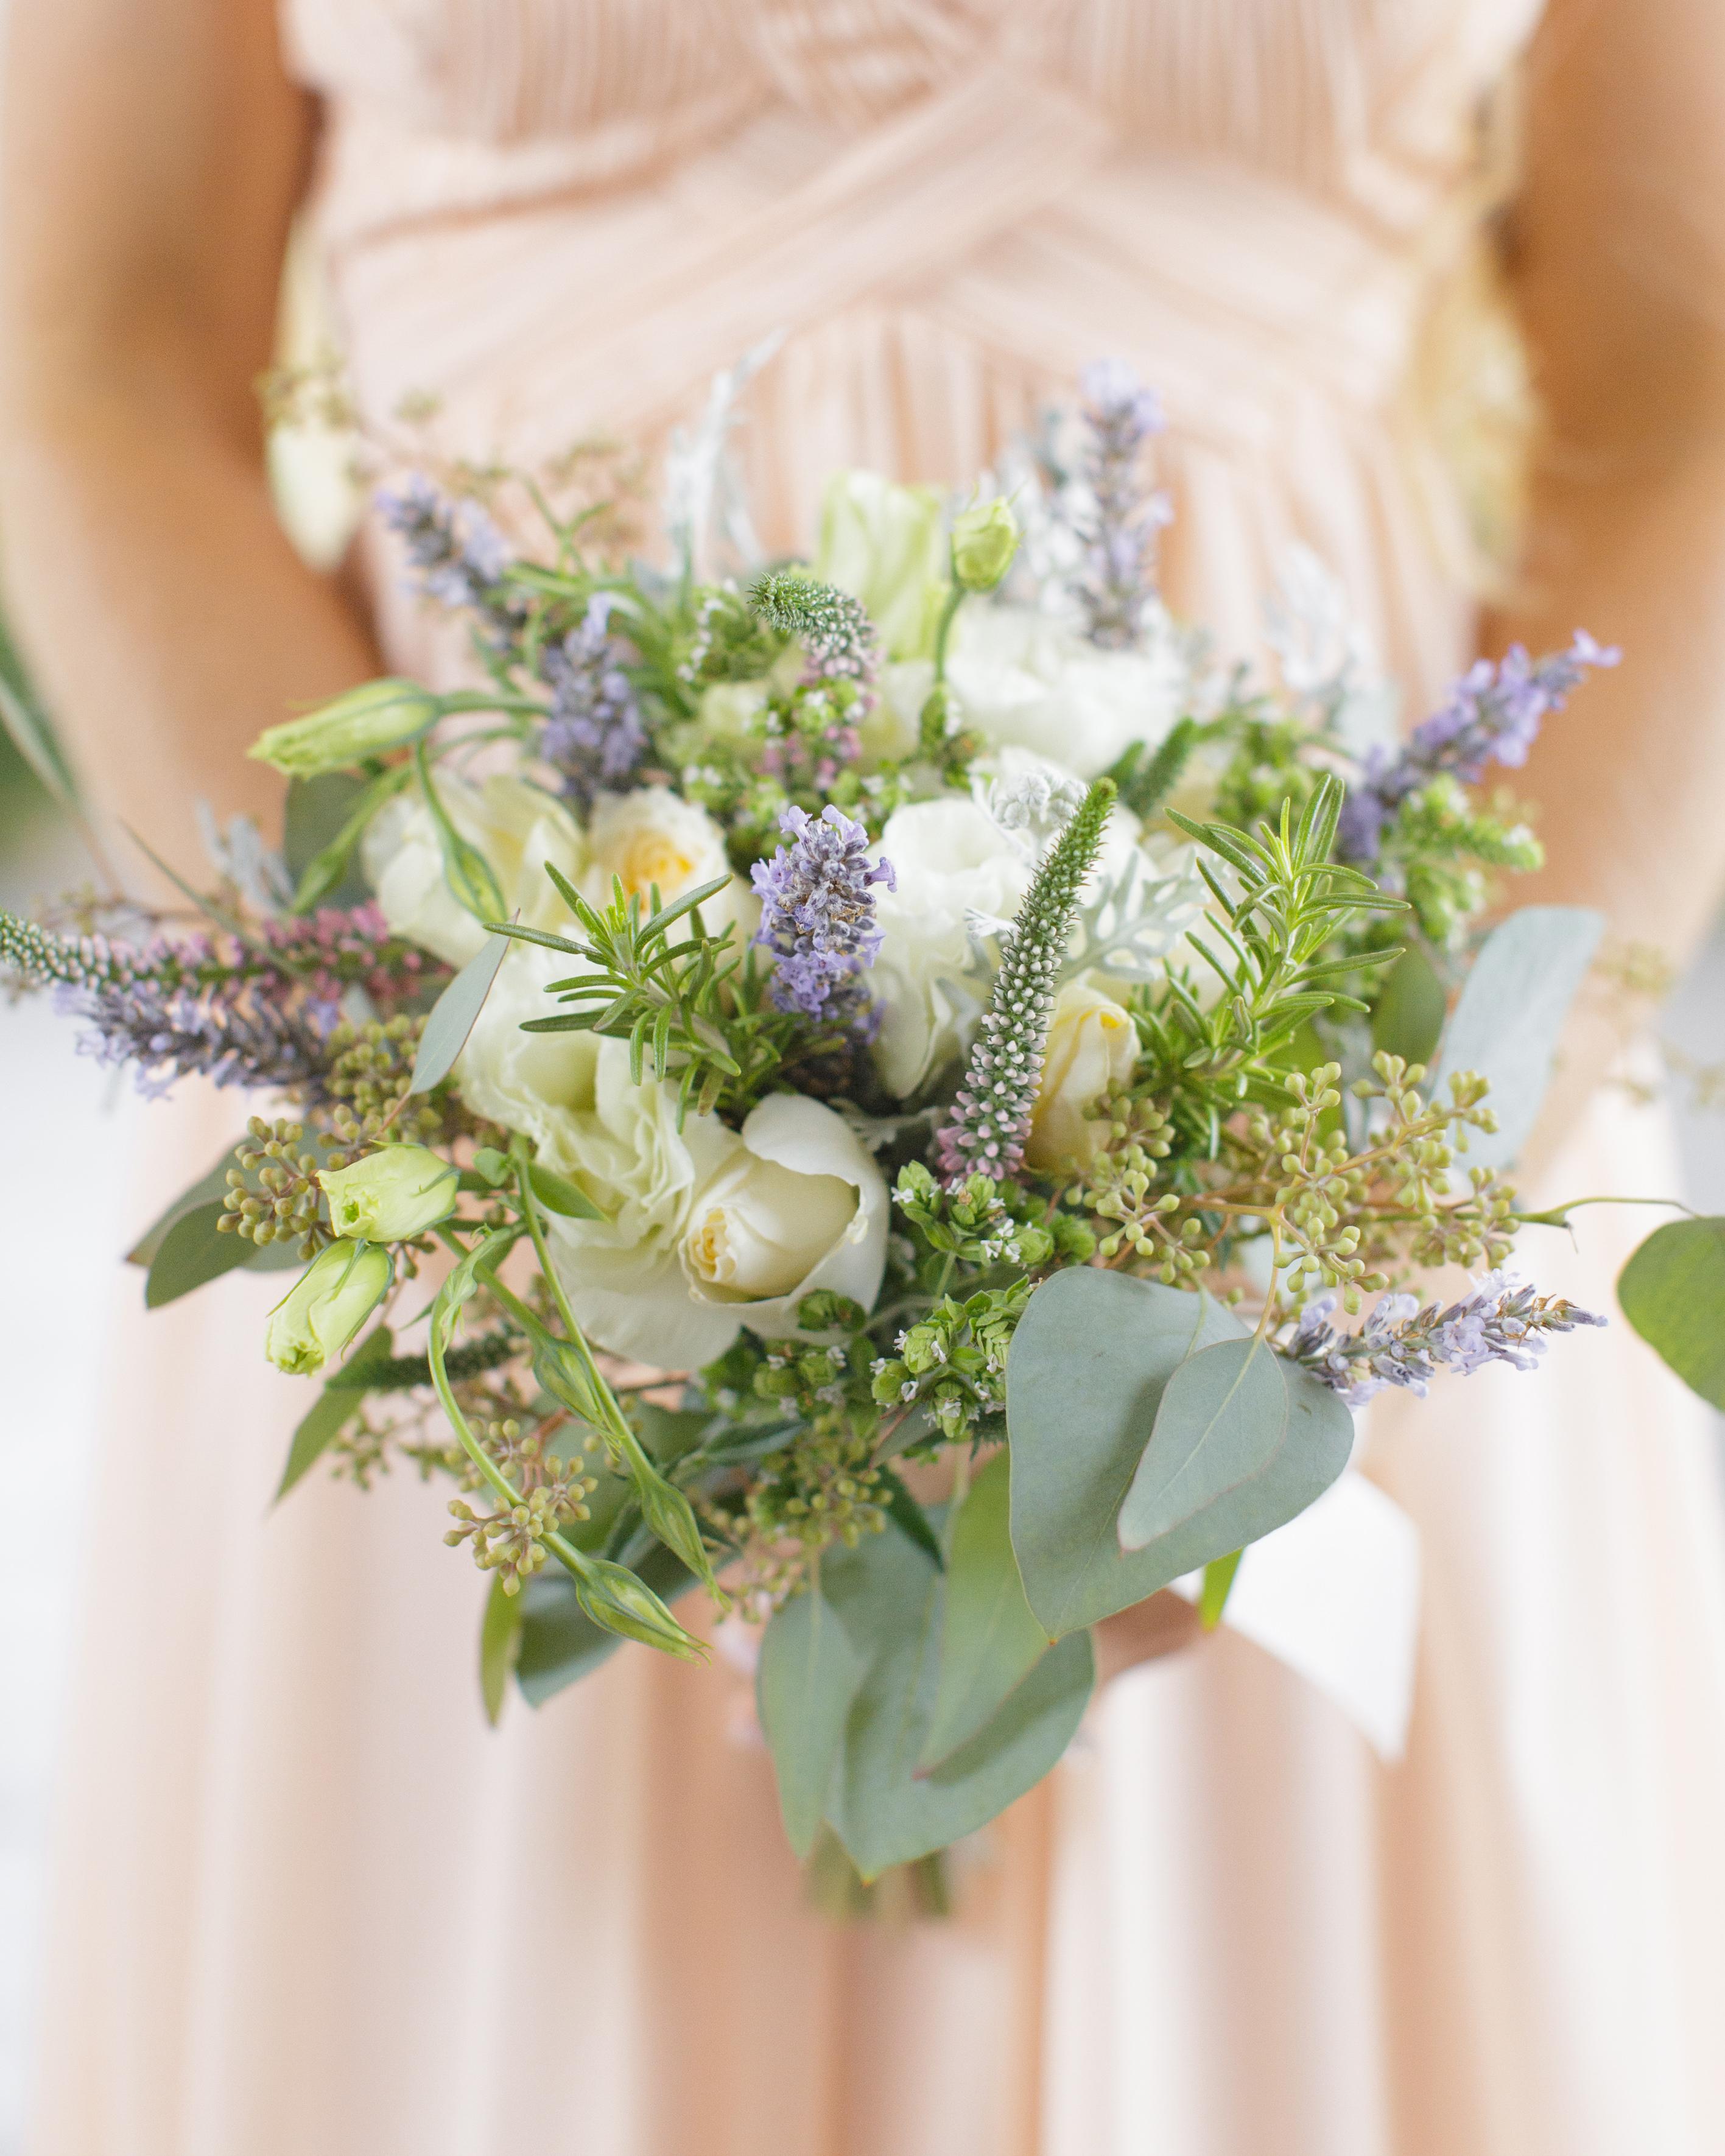 kristin-chris-wedding-bouquet-157-s112398-0116.jpg